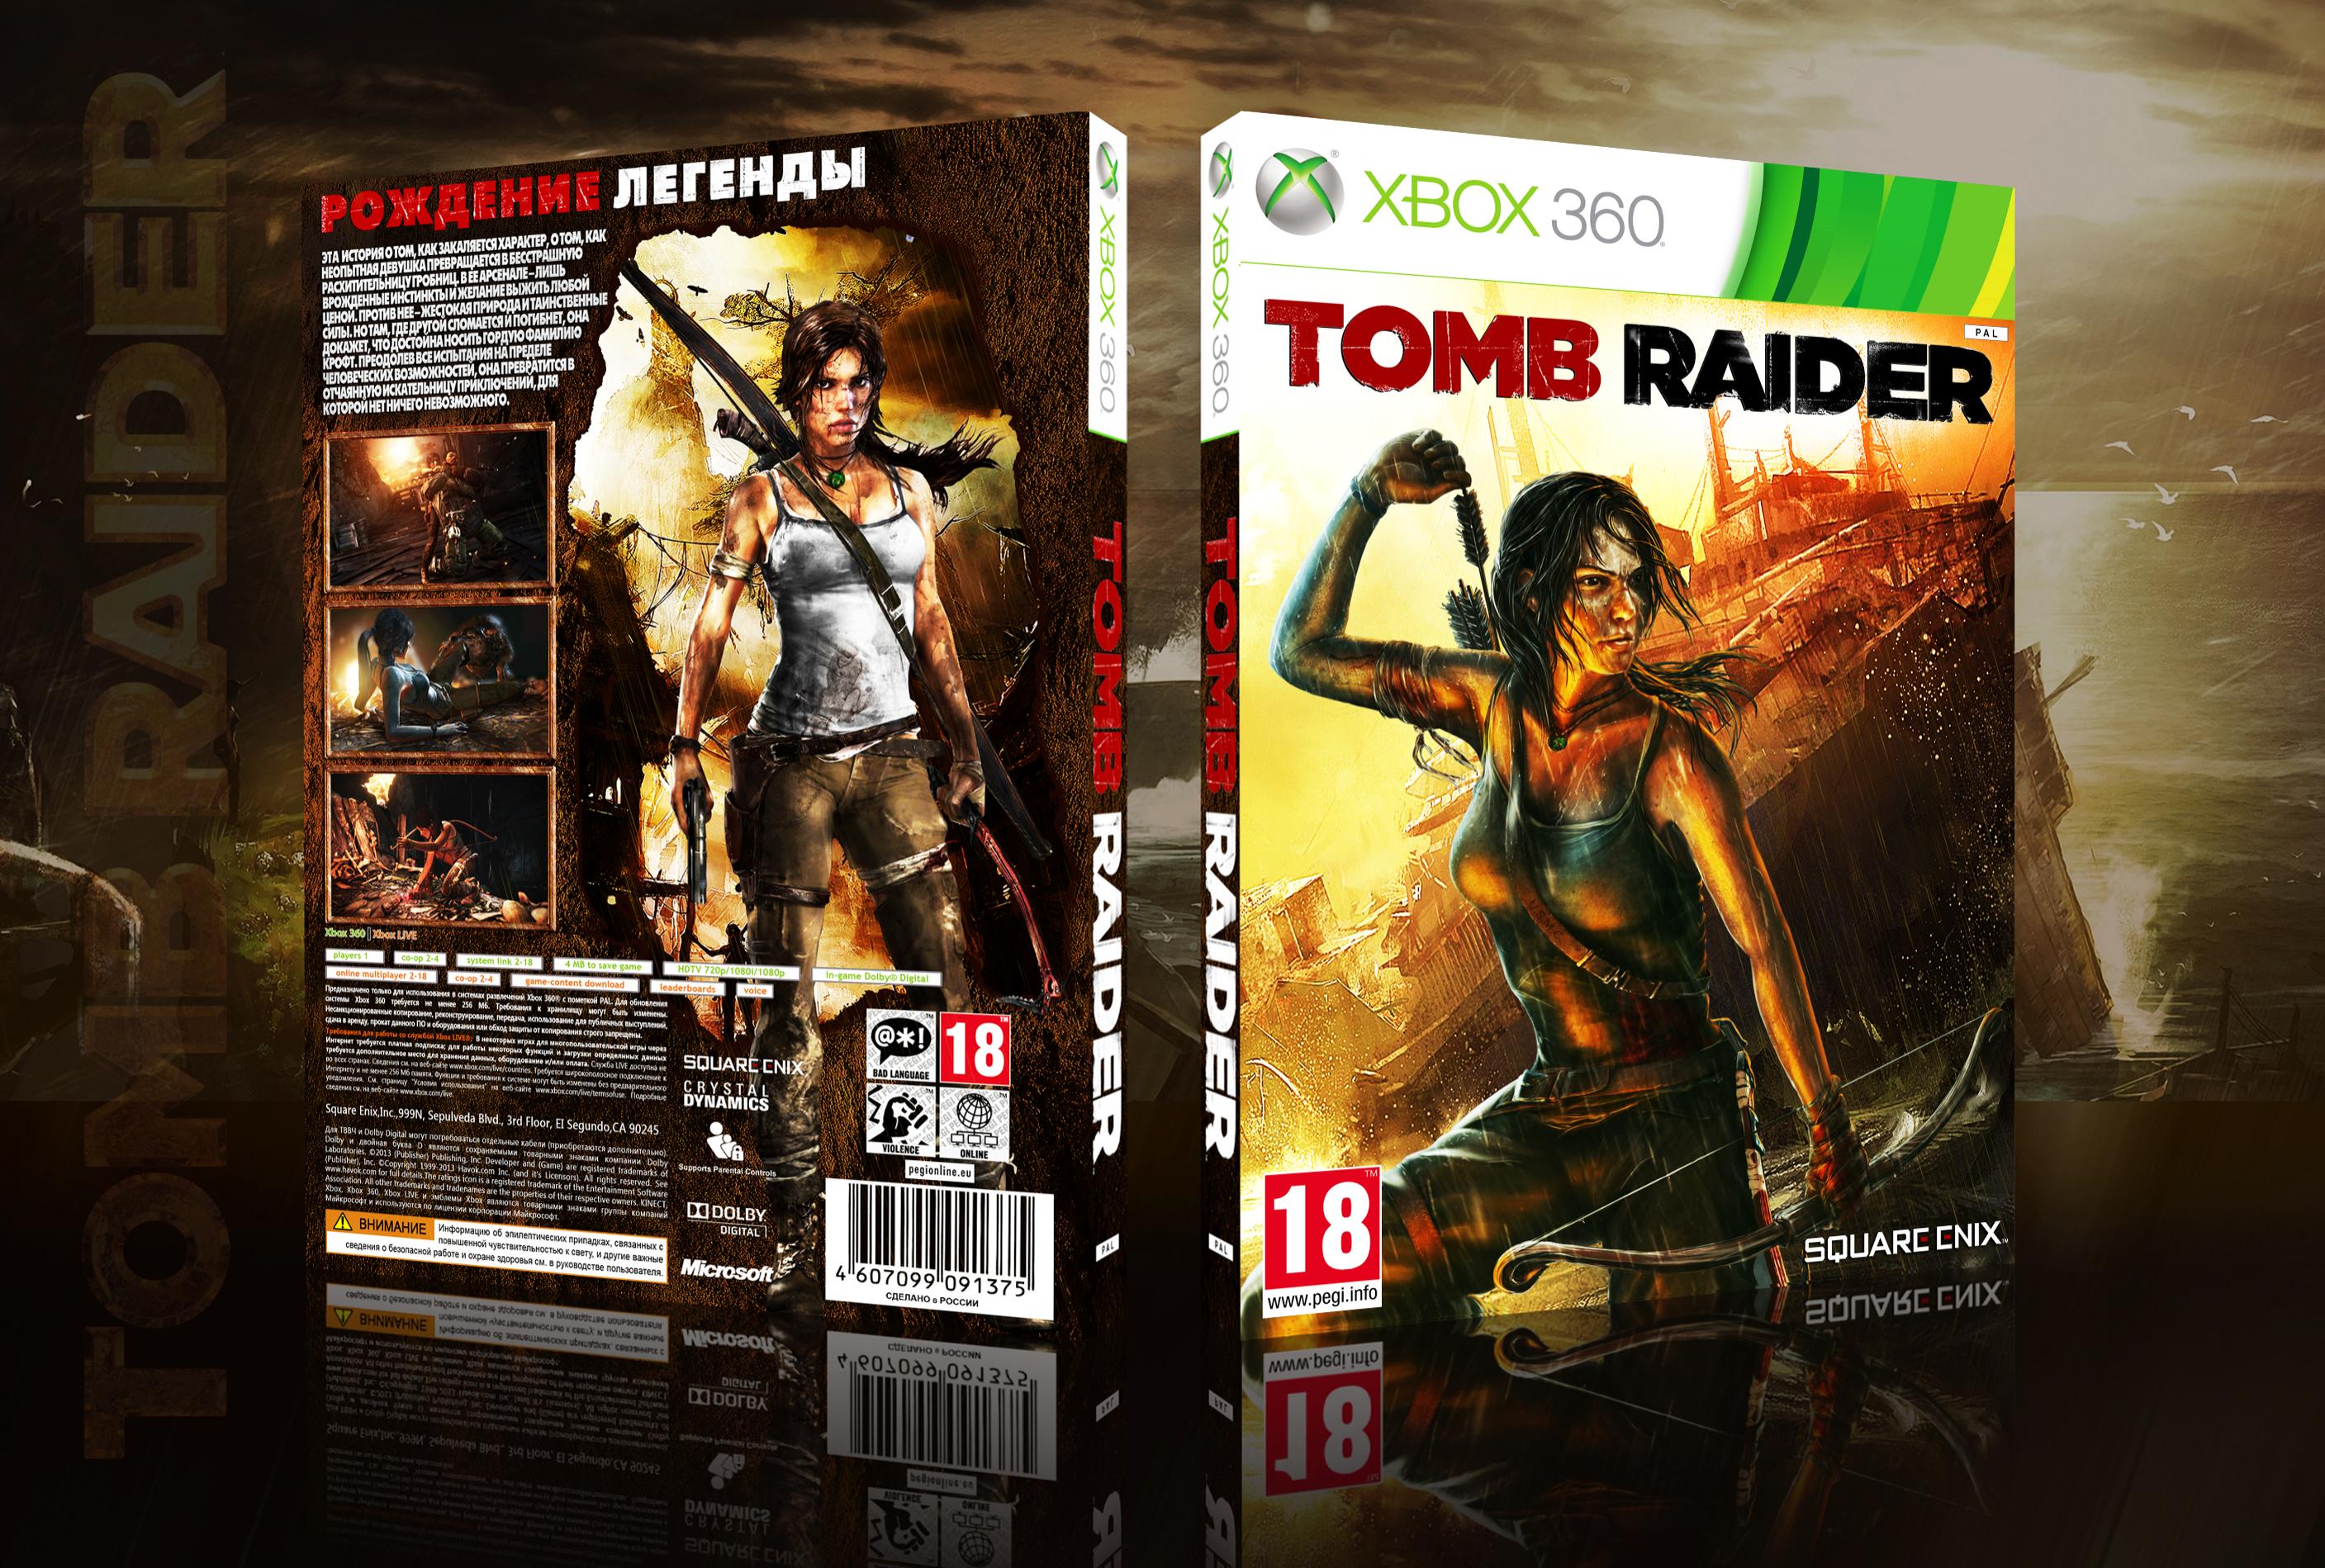 Tomb Raider 2013 Xbox 360 Box Art Cover by fergana16